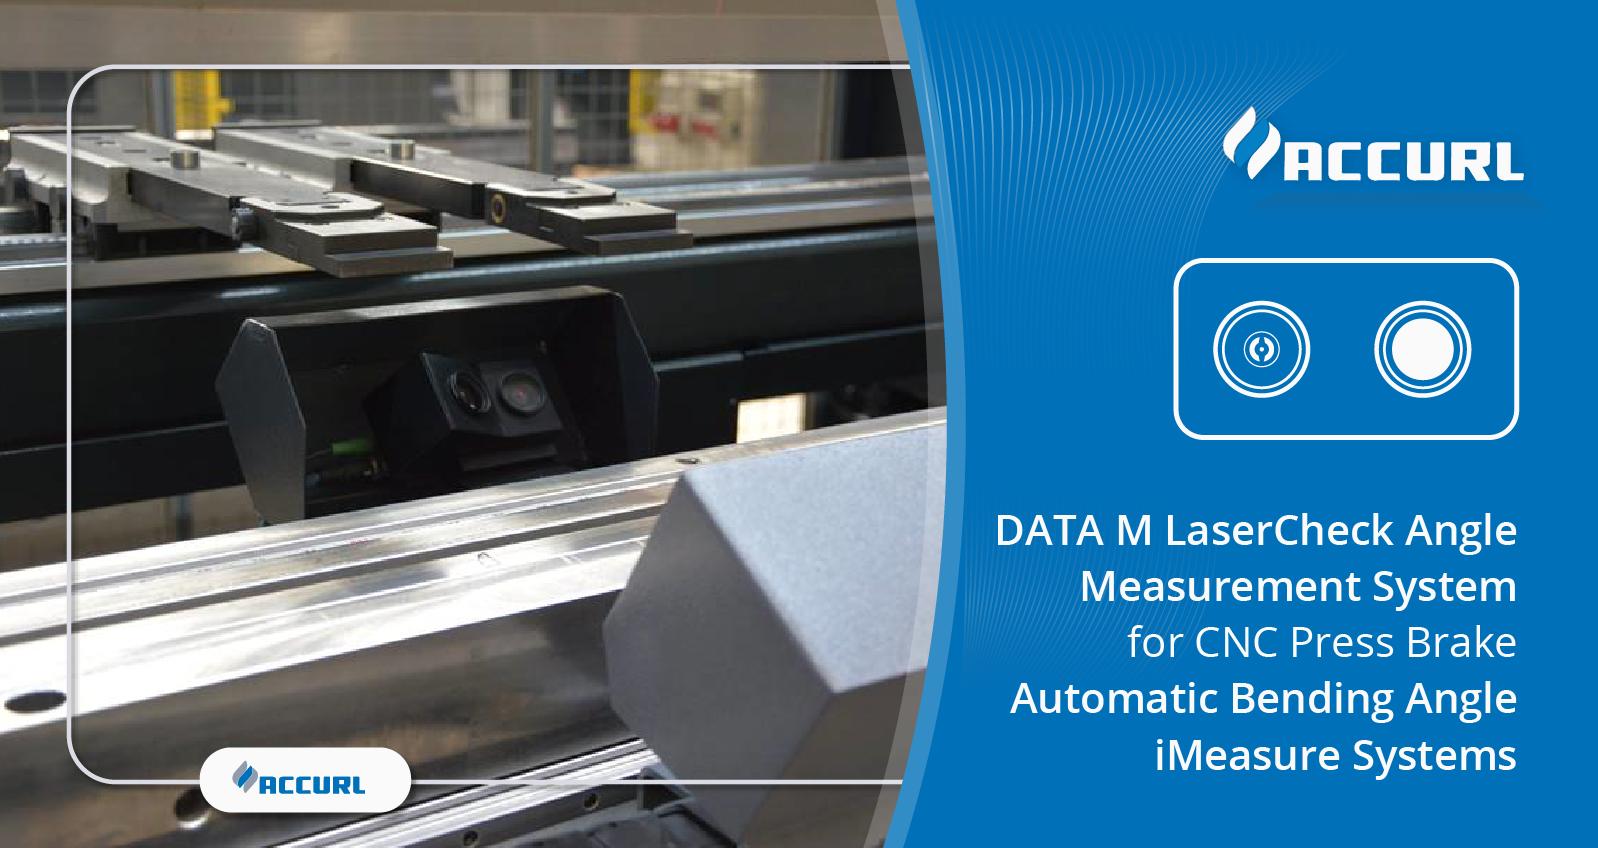 DATA M LaserCheck Angle Measurement System for CNC Press Brake Automatic Bending Angle iMeasure Systems